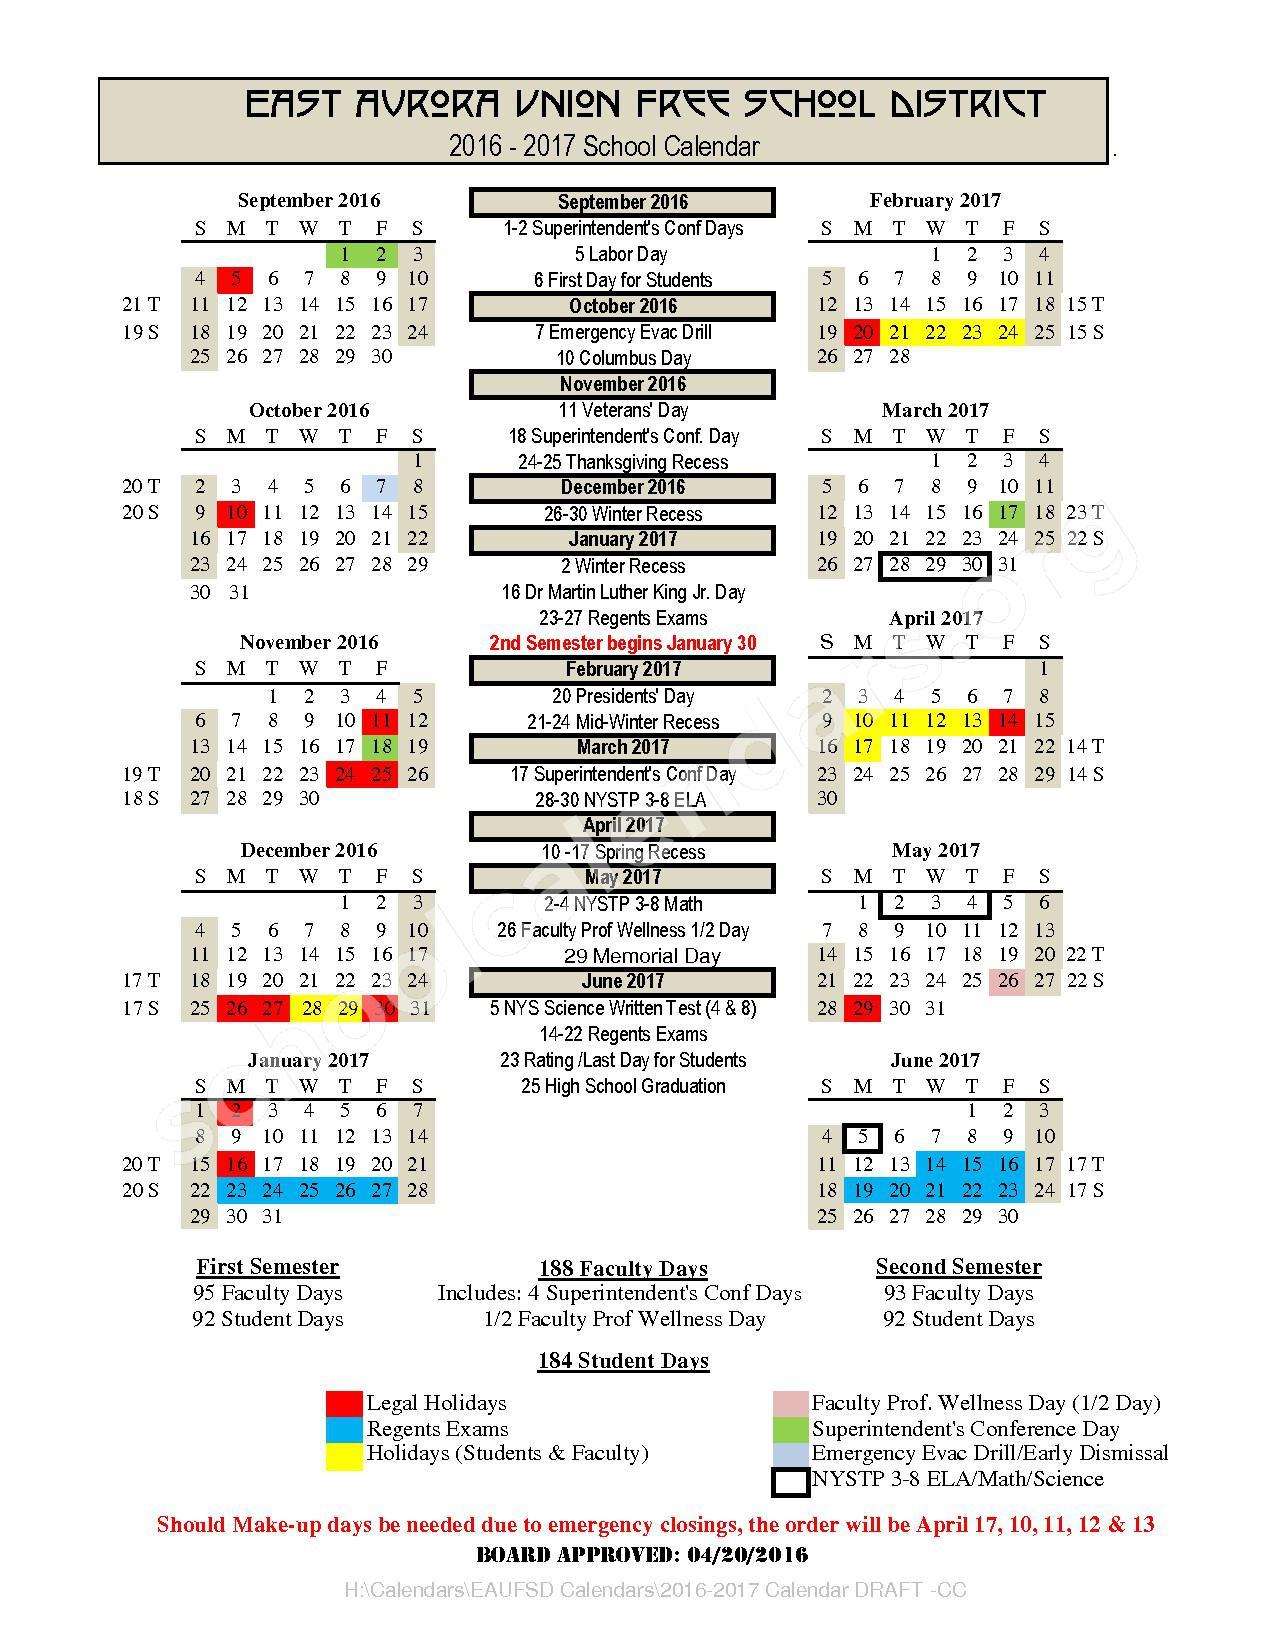 2016 - 2017 School Calendar – East Aurora Union Free School District – page 1